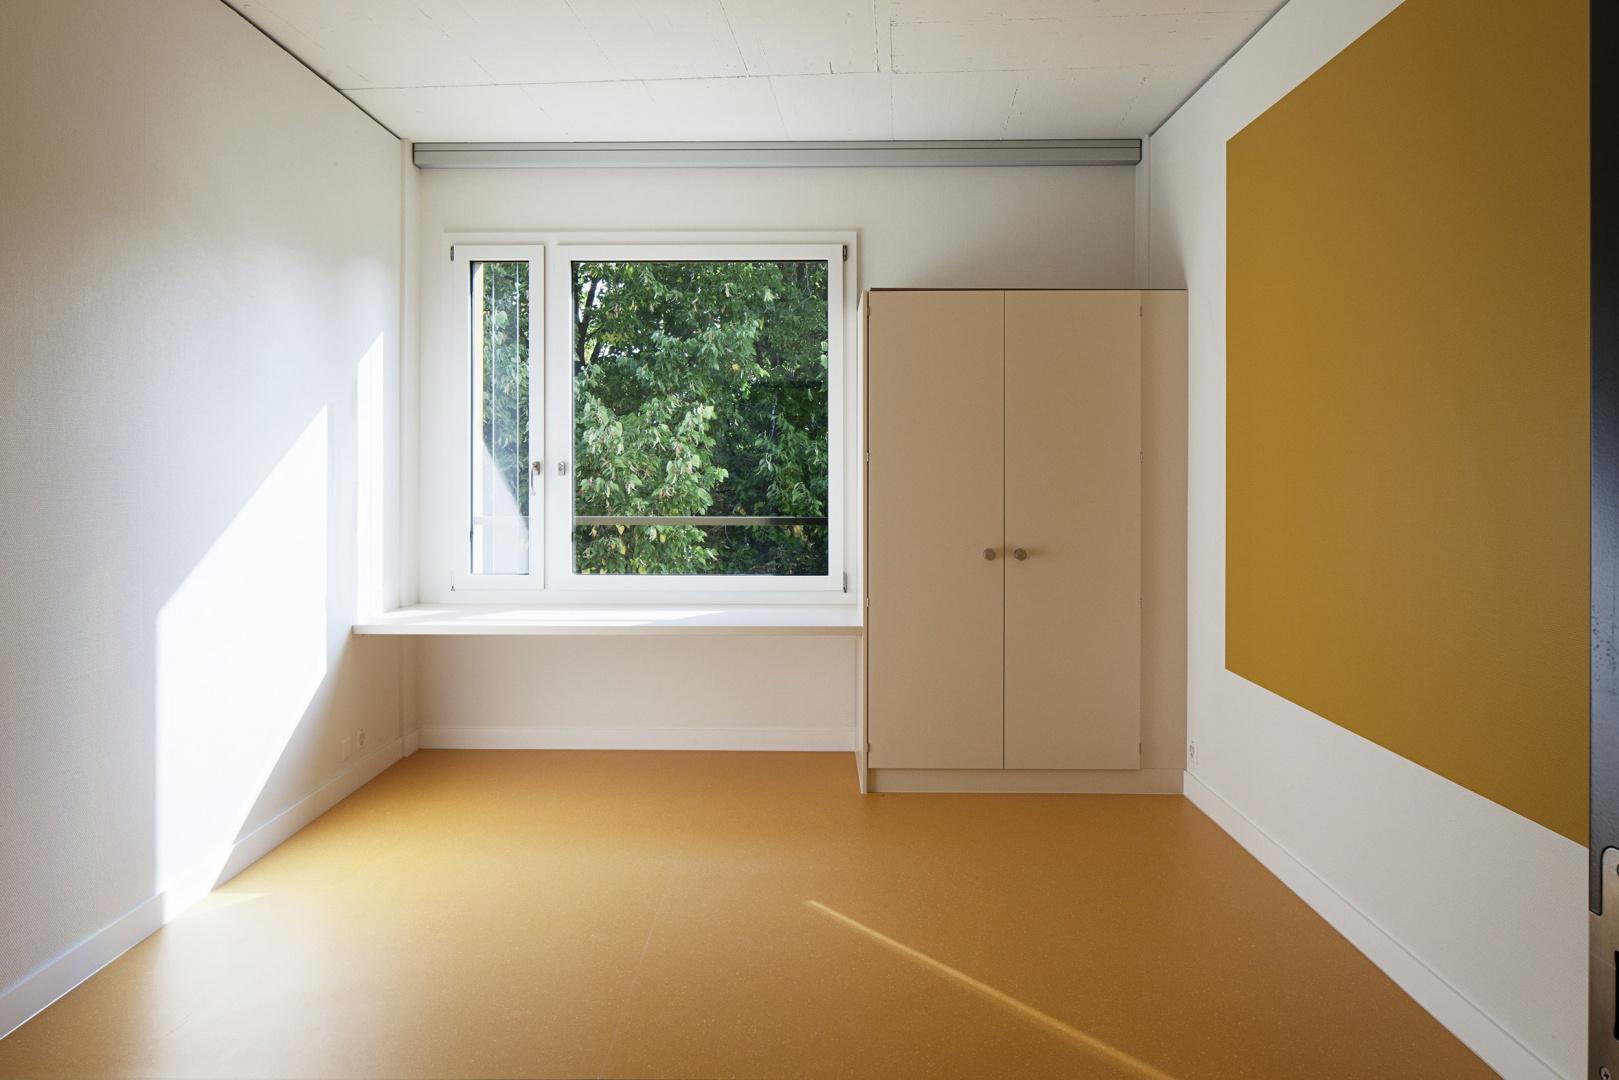 KJPZ_Patientenzimmer © Daniel Erne, Horgen